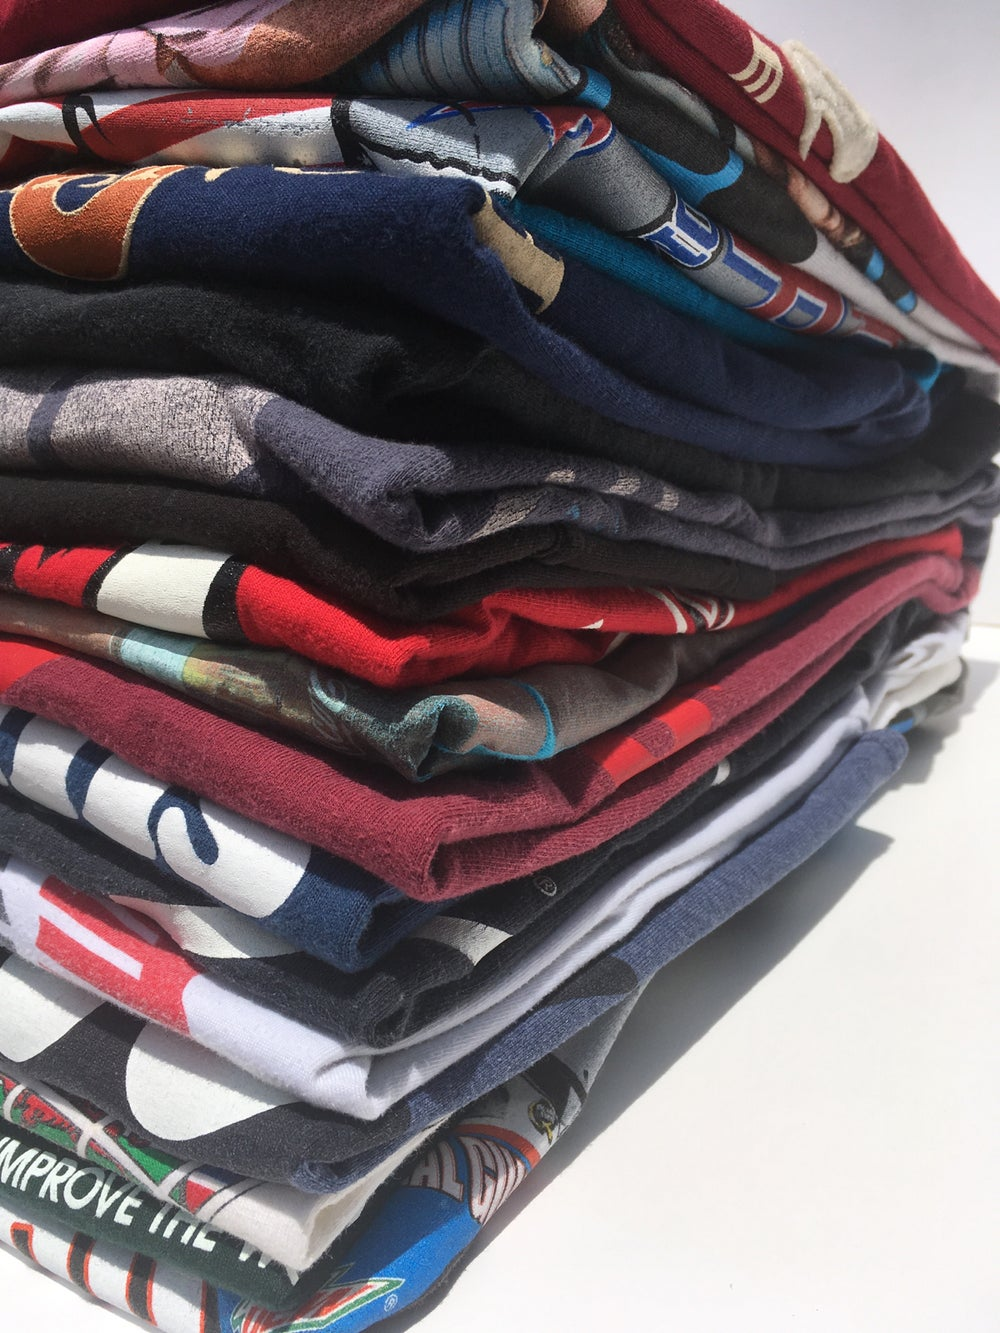 $5 T-shirt Club (3 month subscription)